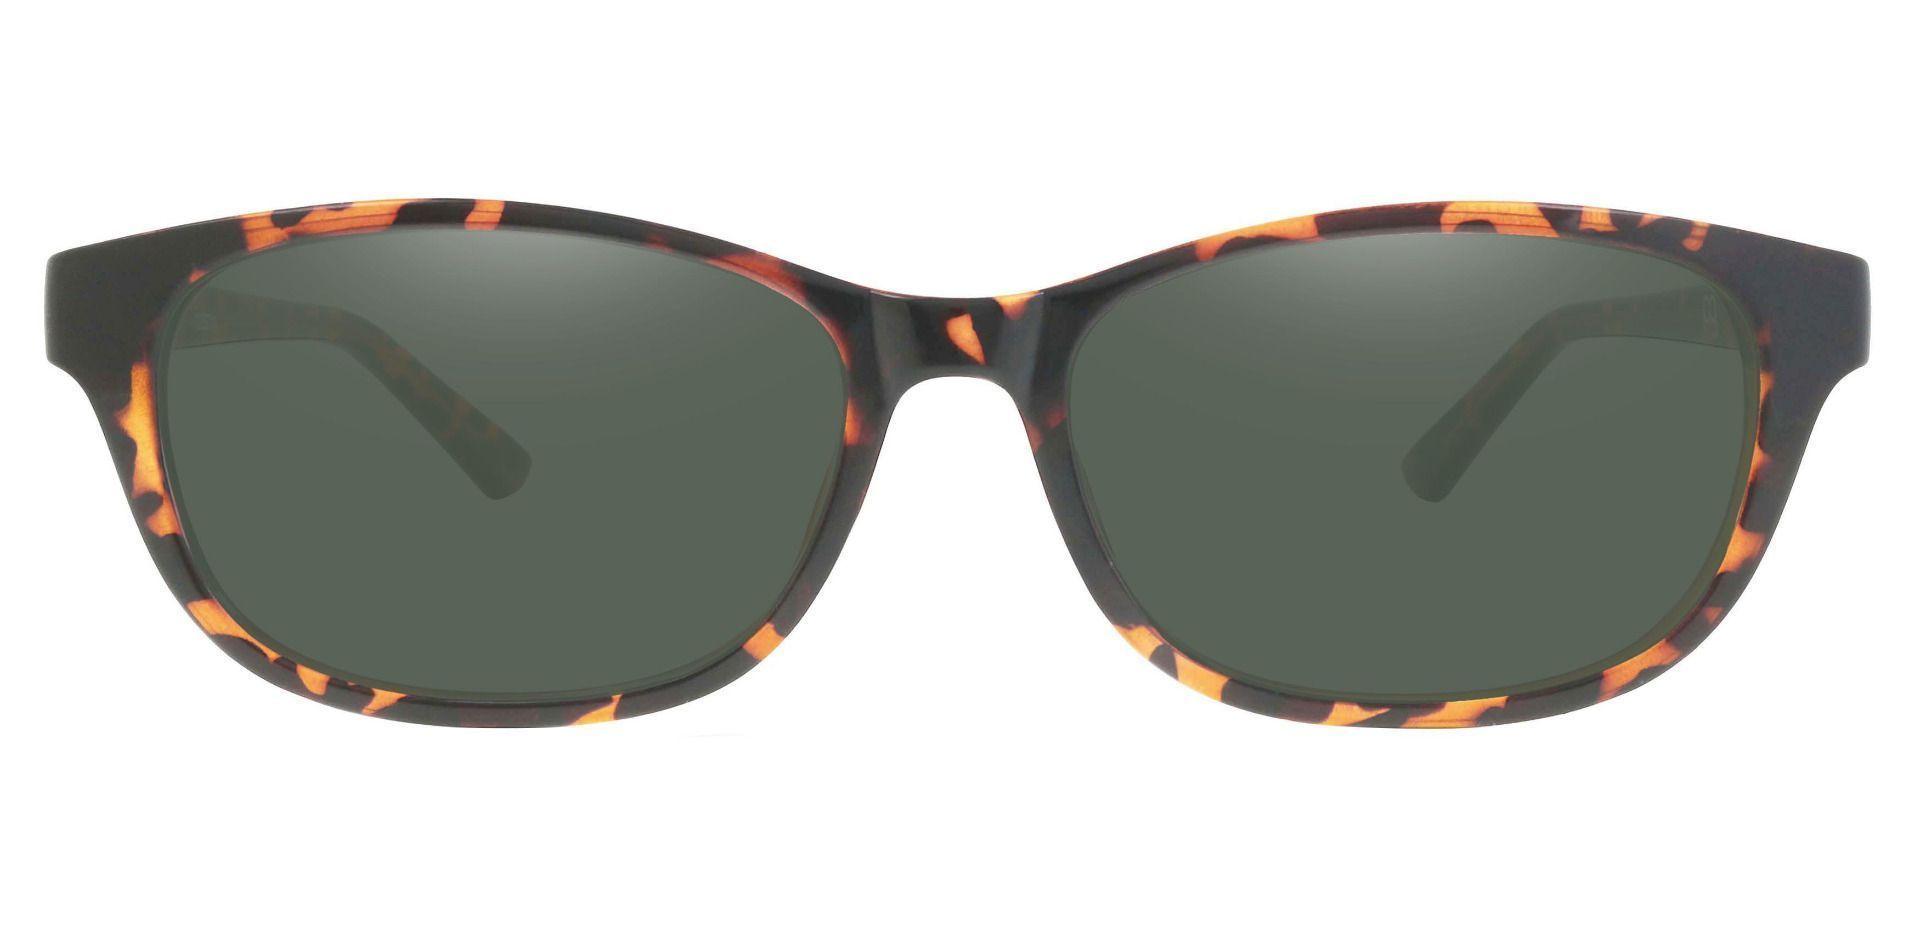 Reyna Classic Square Prescription Sunglasses - Tortoise Frame With Green Lenses